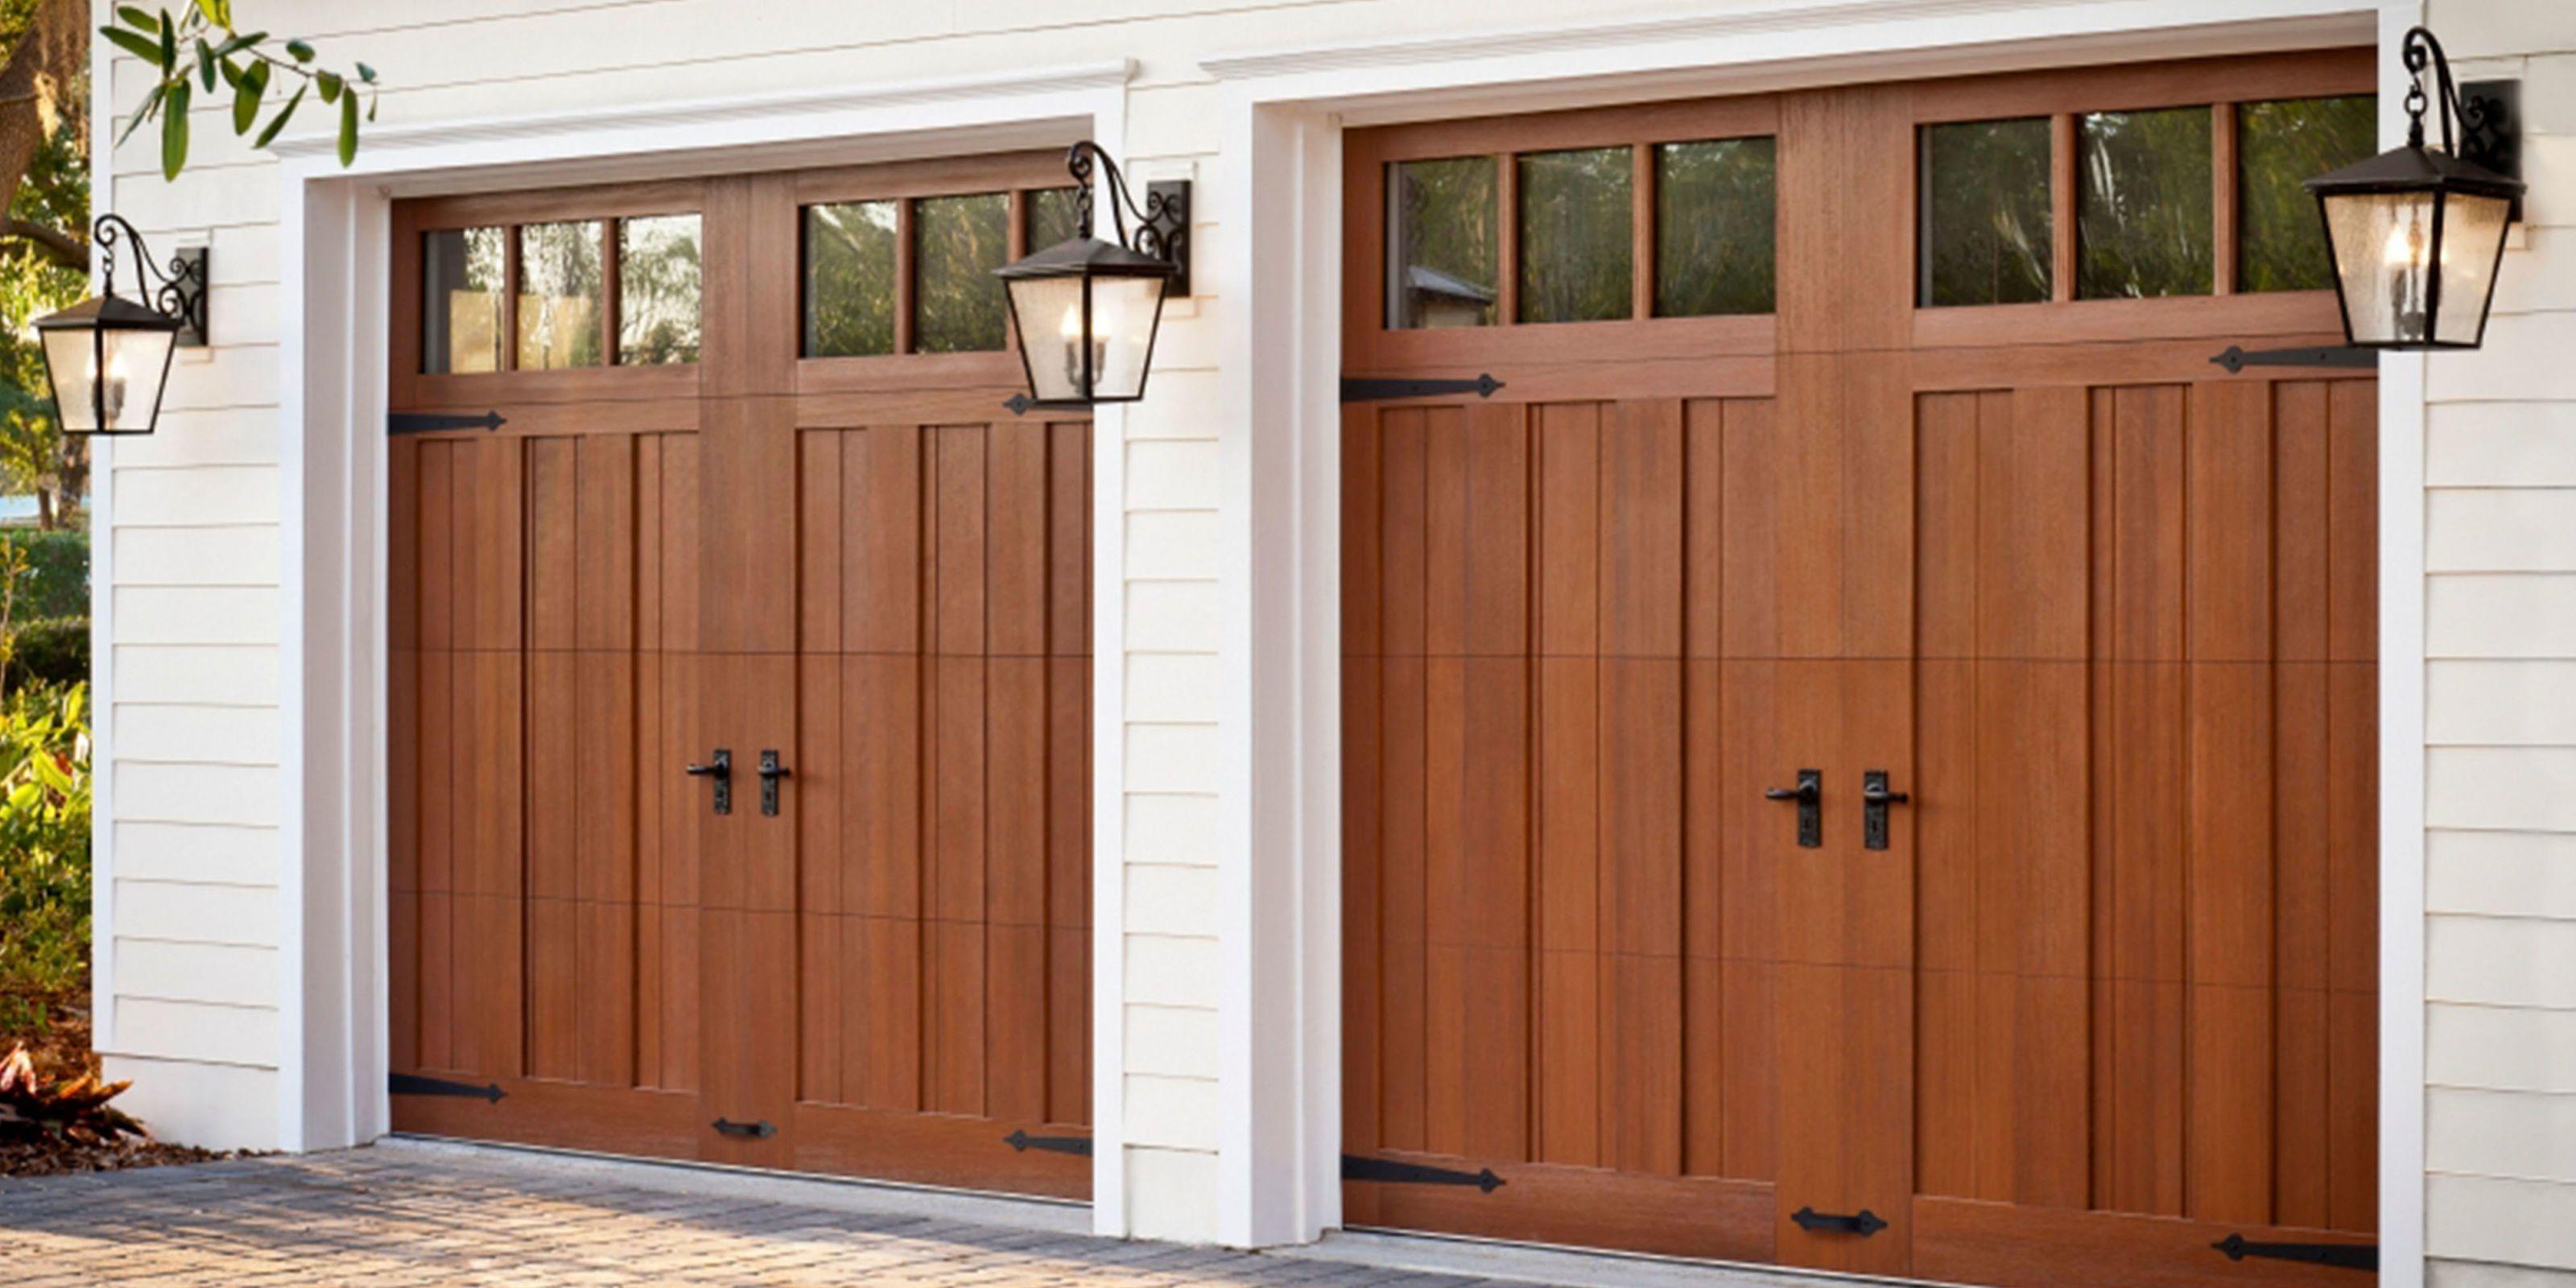 image & Clopay Door Imagination System Review - How To Choose a Garage Door